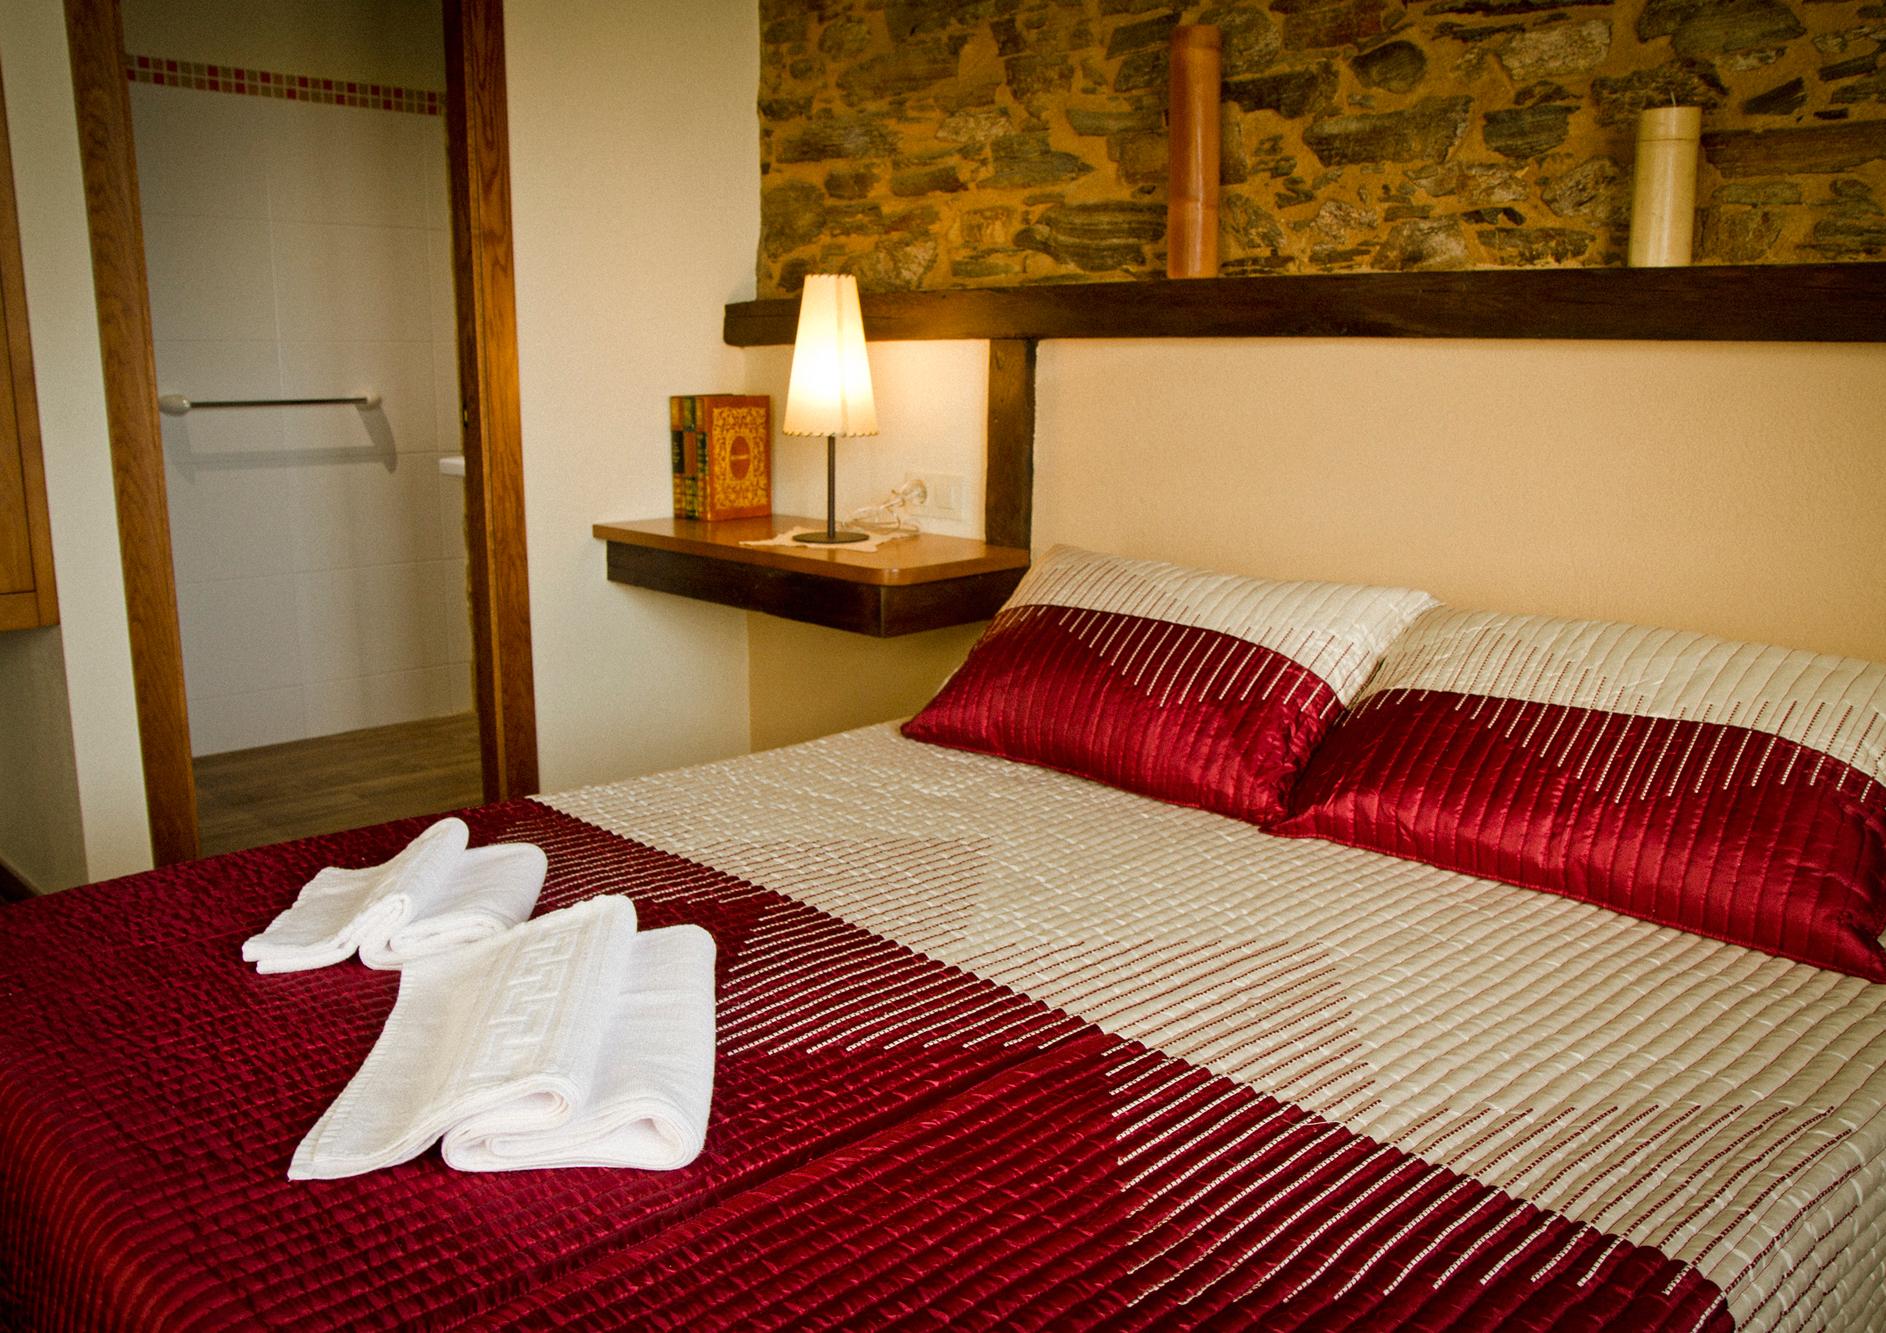 Habitación doble con cama de matrimonio del Apartamento Eduardo Pondal